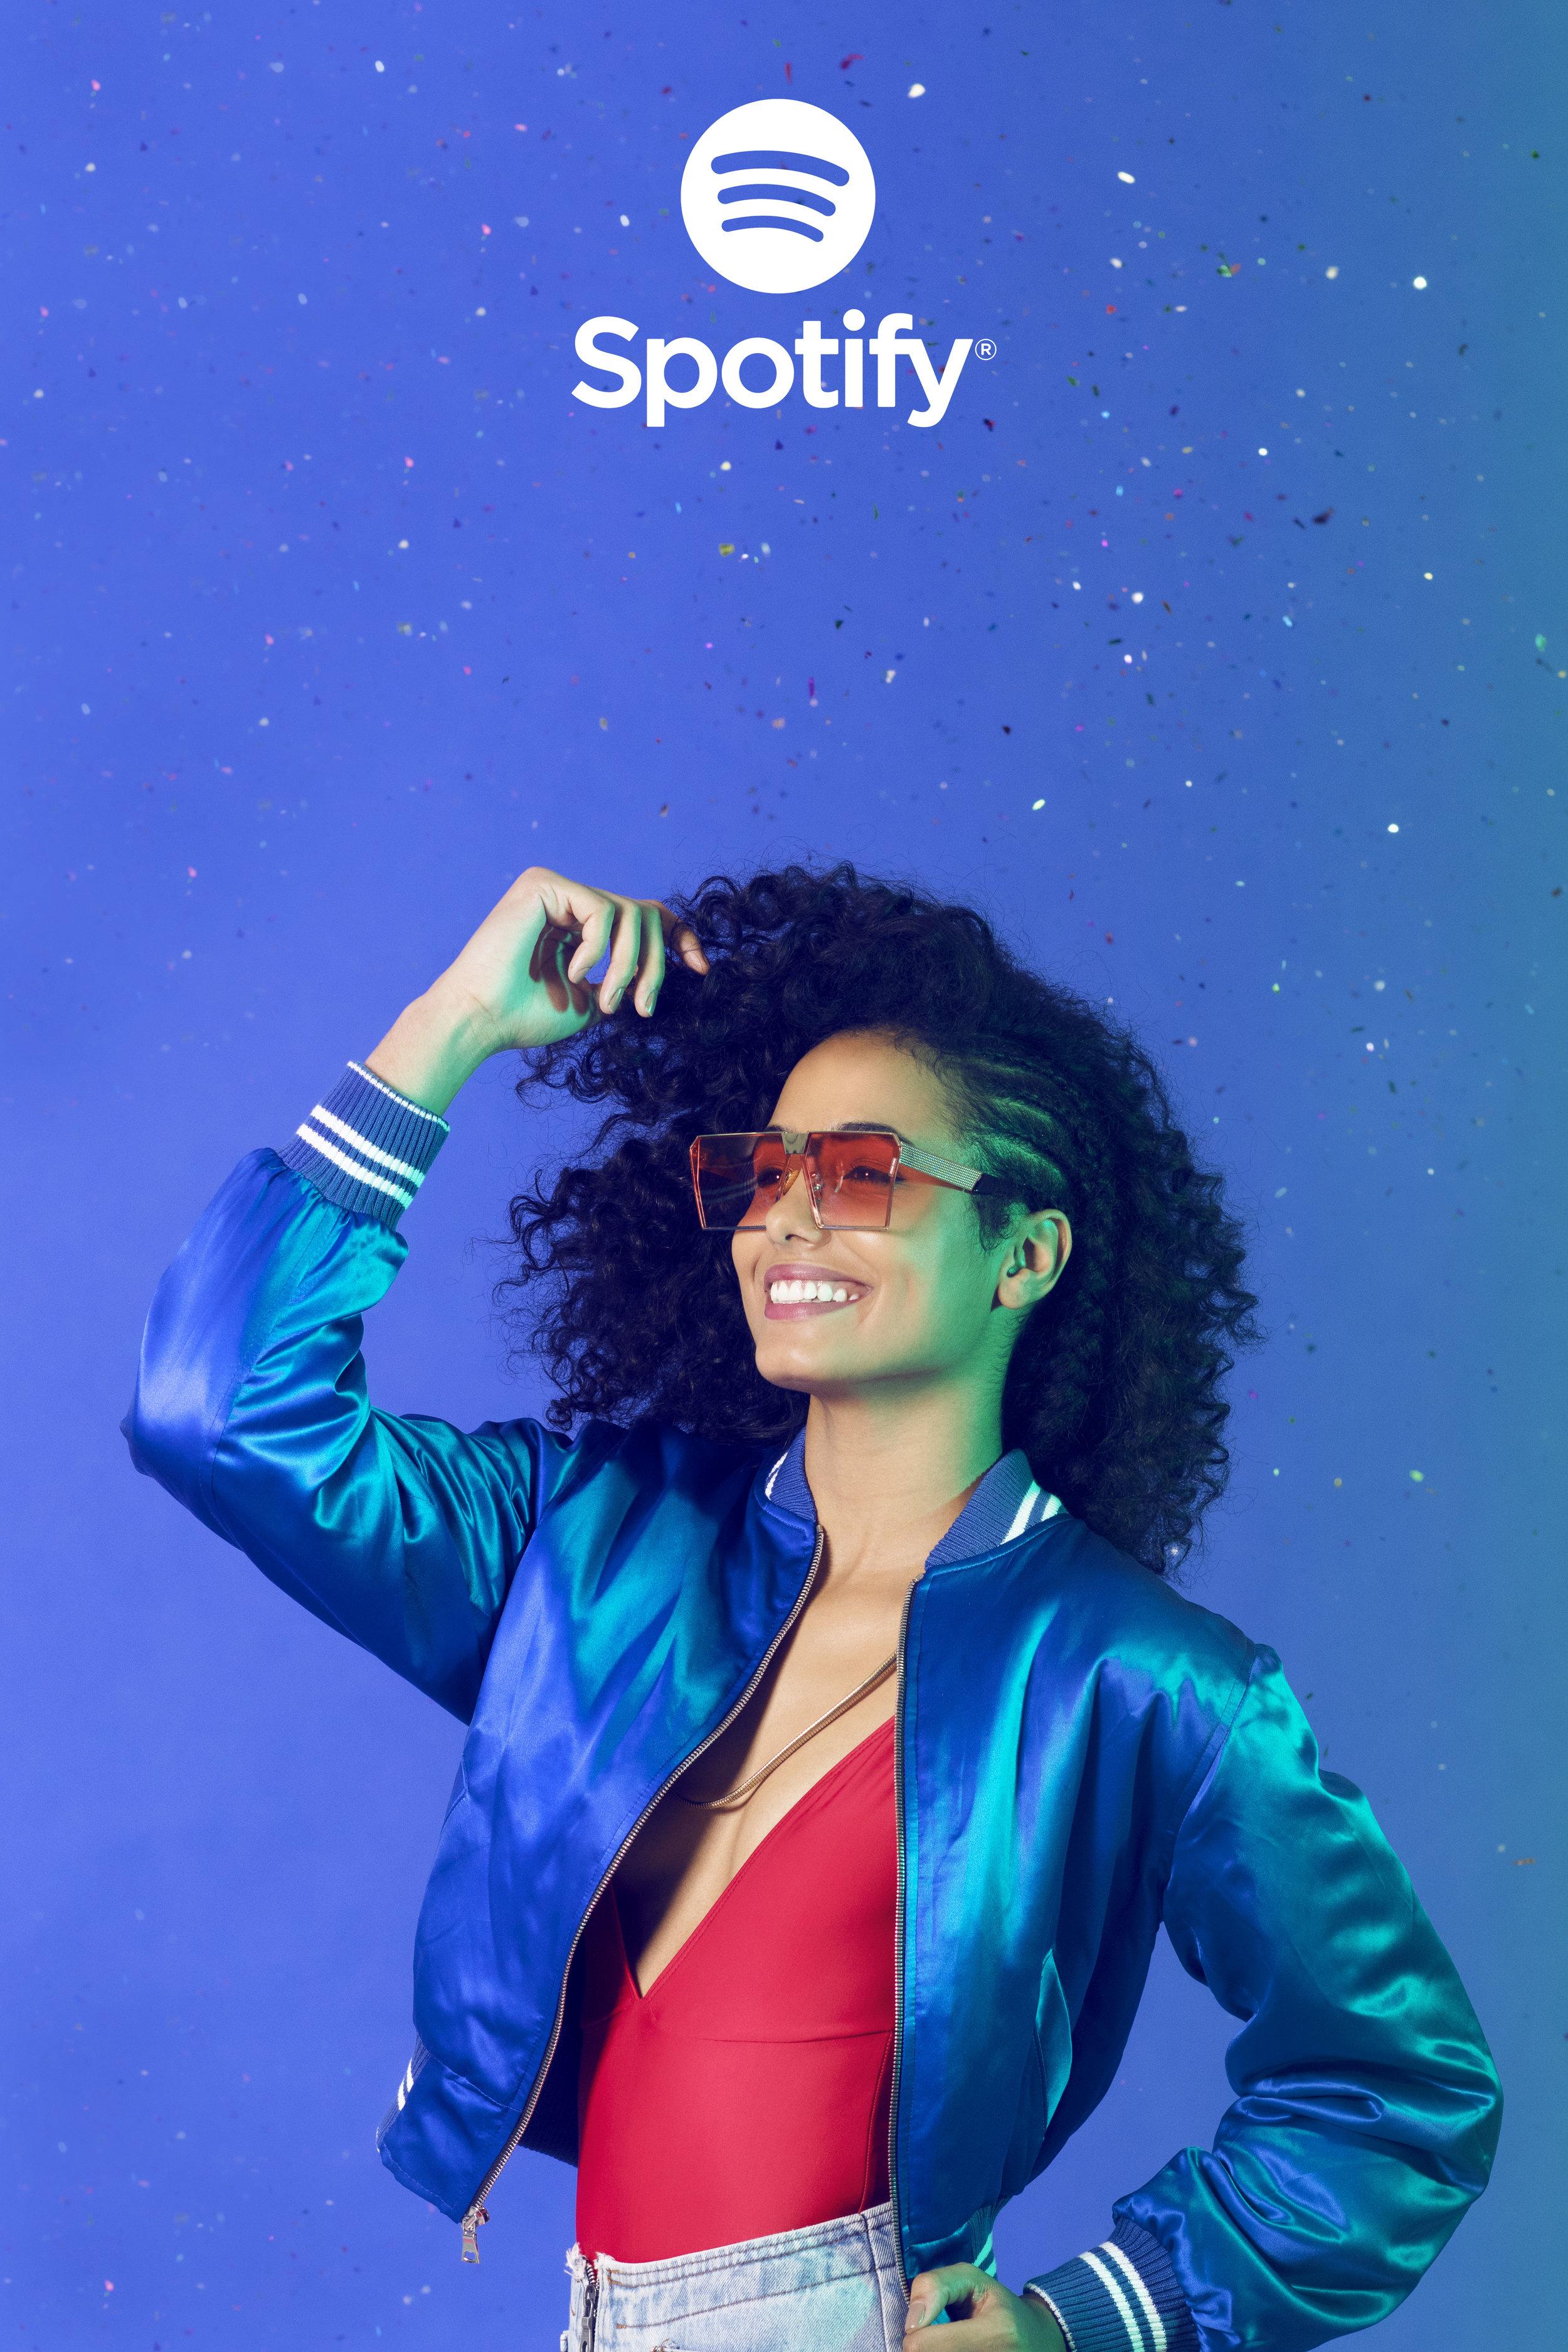 SPOTIFY / advertising